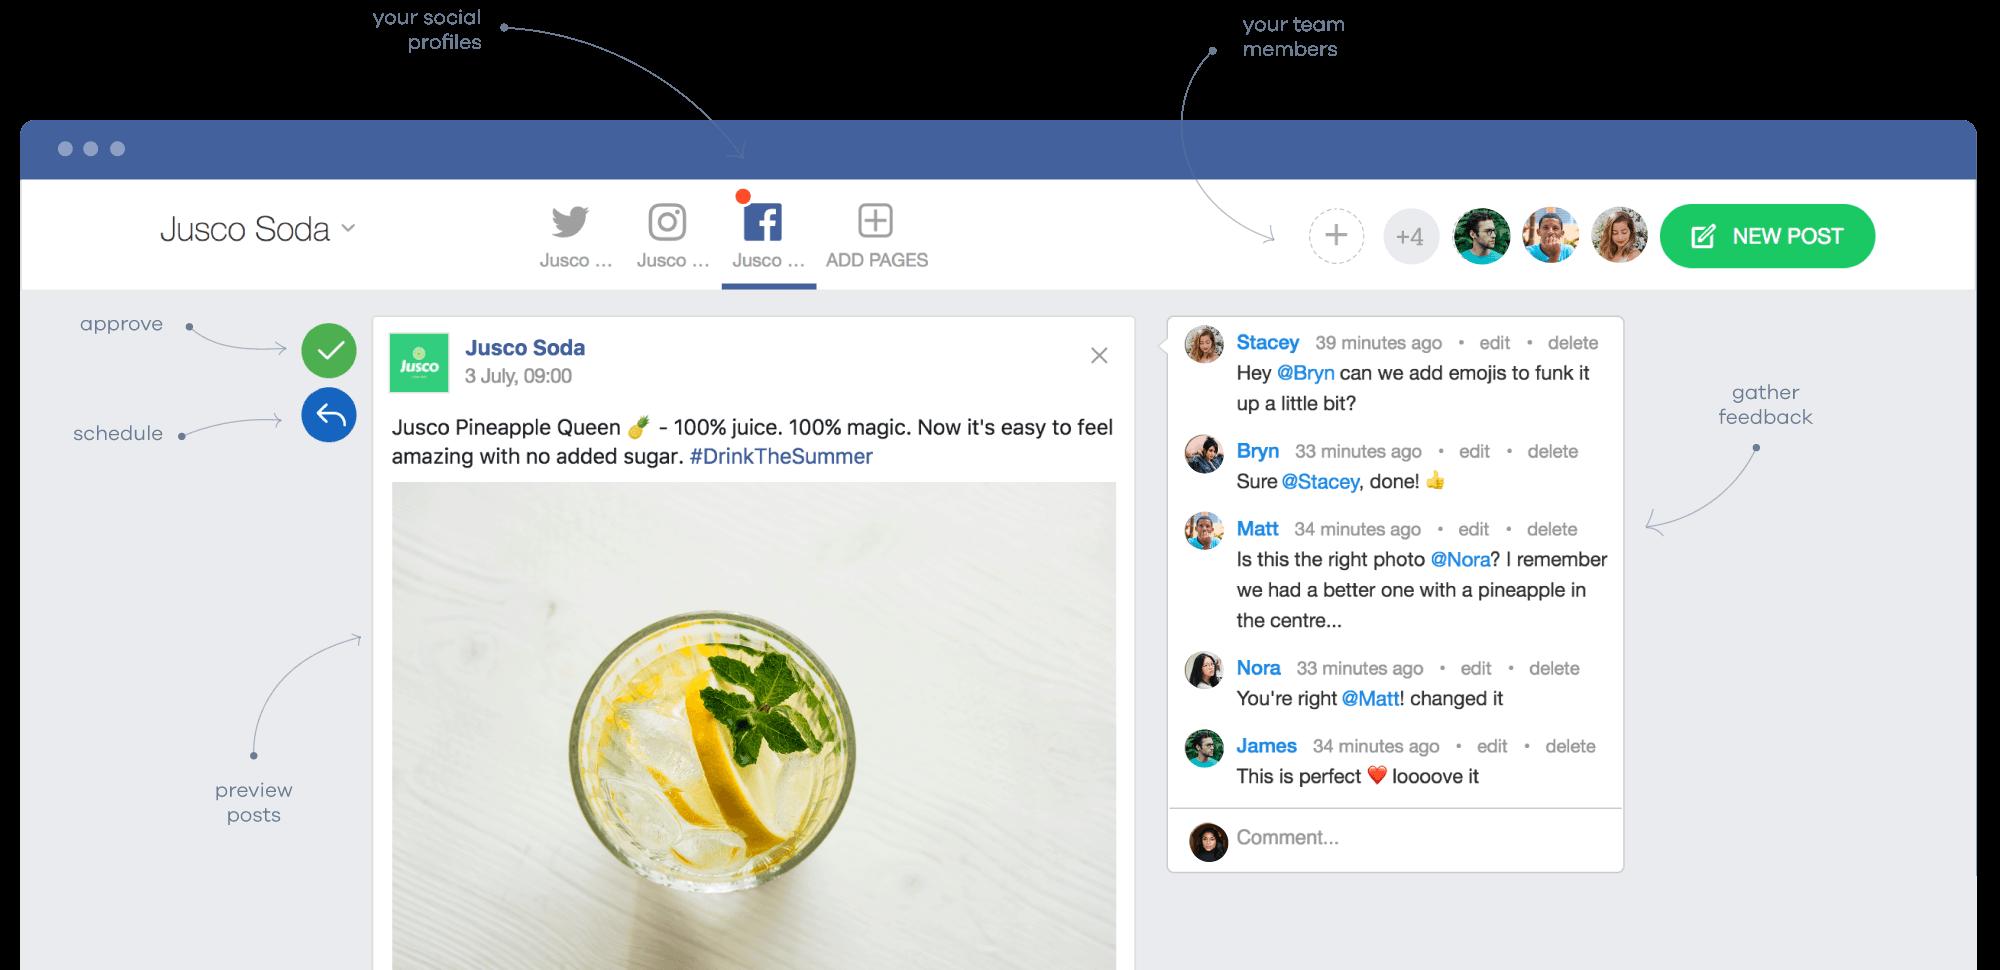 Planable - Social Media Collaboration Platform for Agencies, Freelancers and Marketing Teams